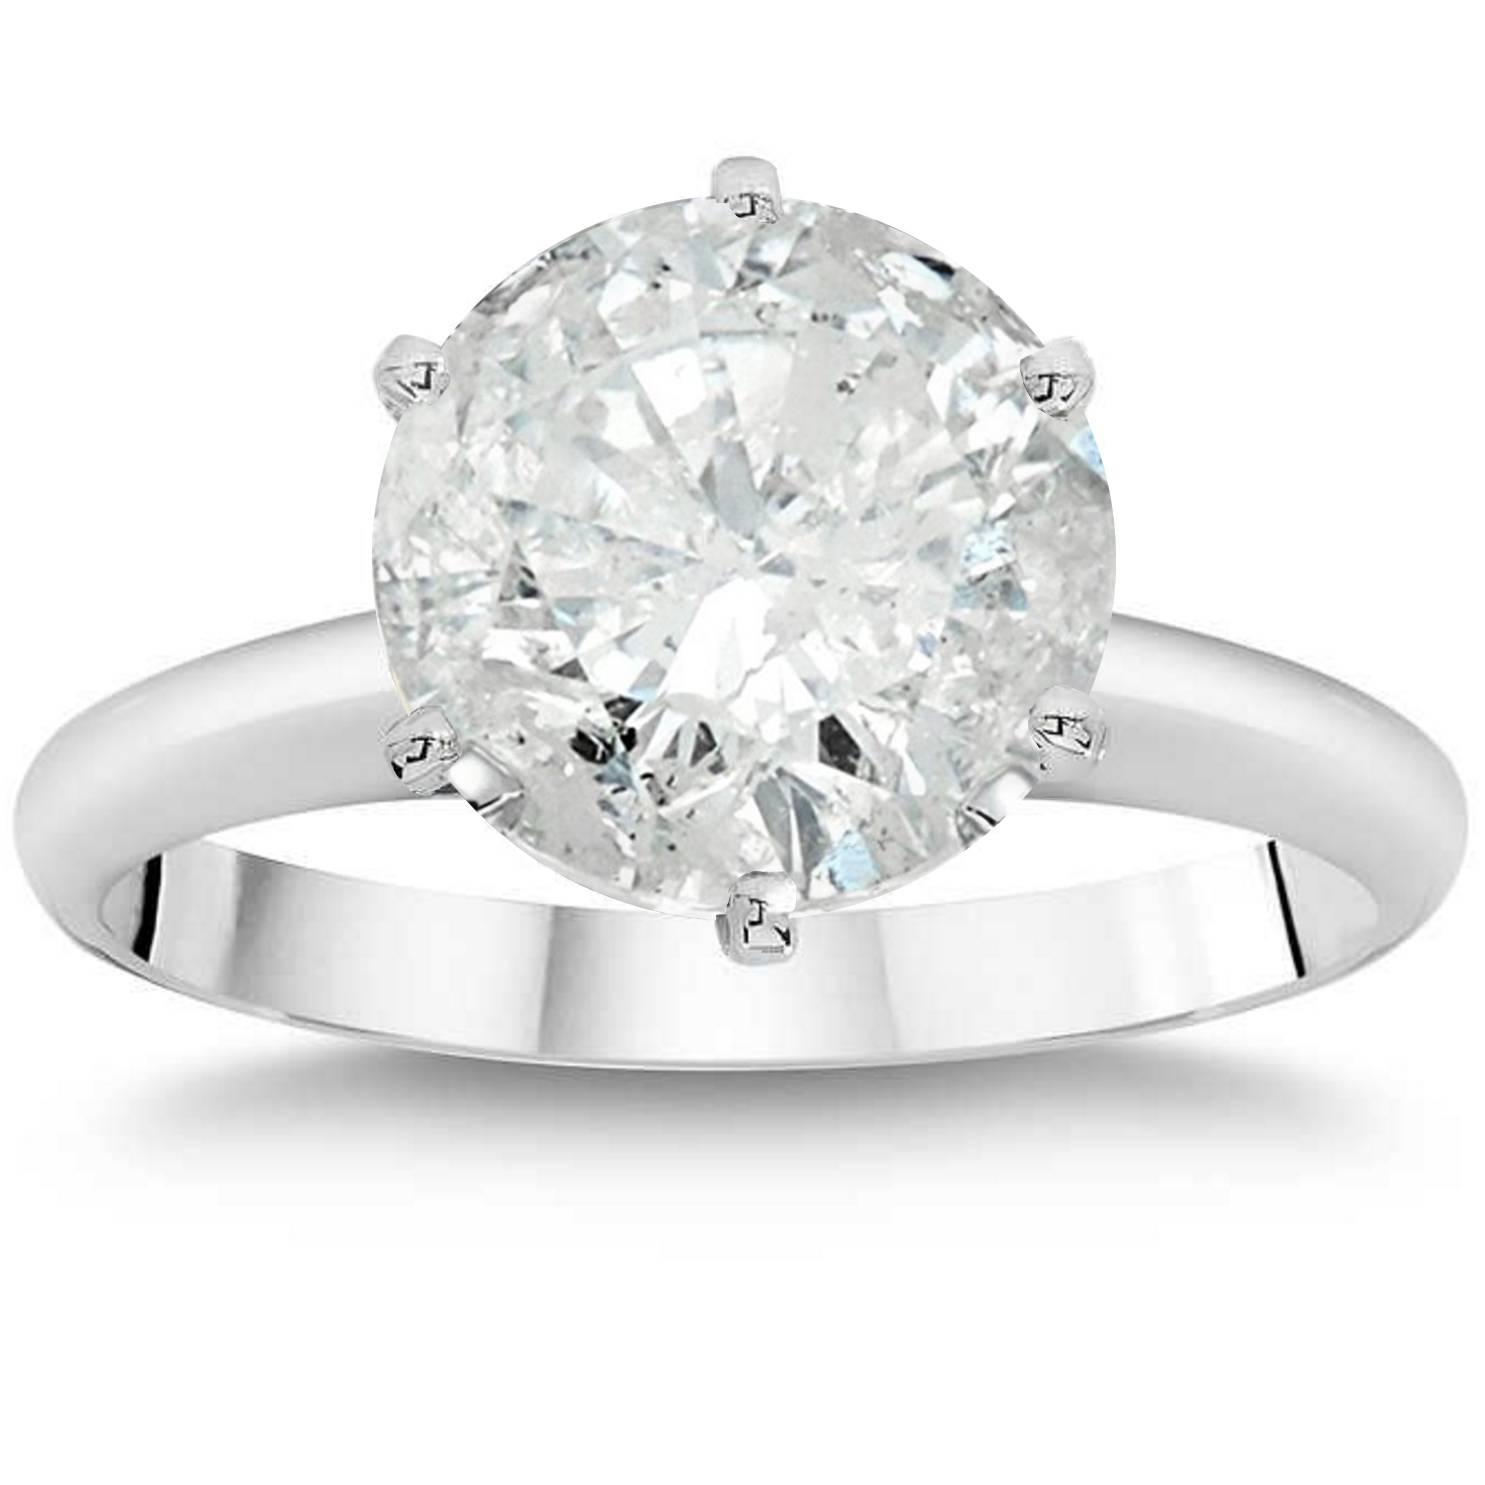 Pompeii3: 3Ct Round Brilliant Diamond Solitaire Engagement Ring 14K White  Gold Enhanced | Rakuten Within Round Brilliant Diamond Engagement Rings (Gallery 18 of 25)